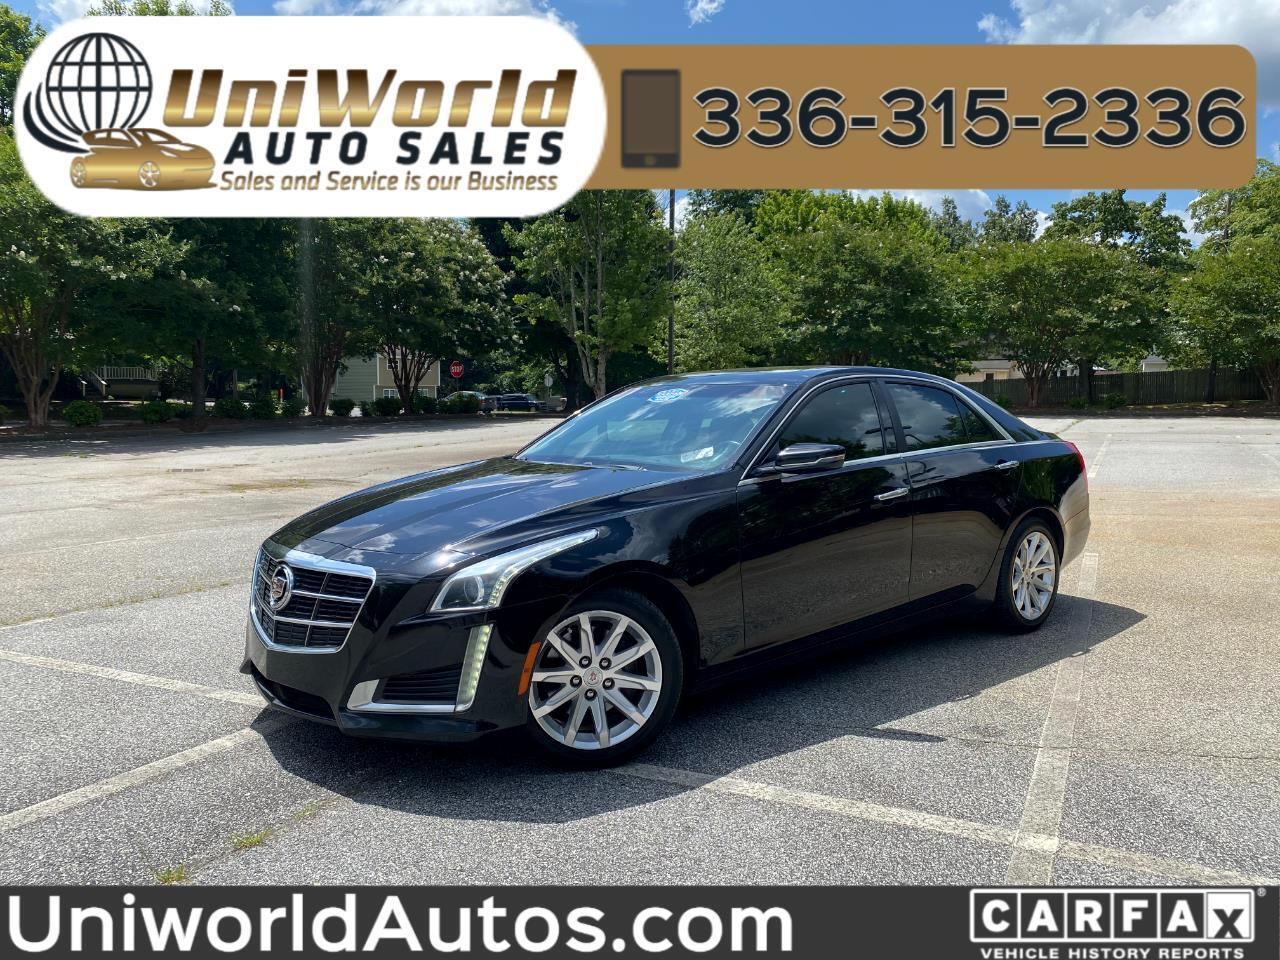 Cadillac CTS Sedan 4dr Sdn 2.0L Turbo Luxury RWD 2014